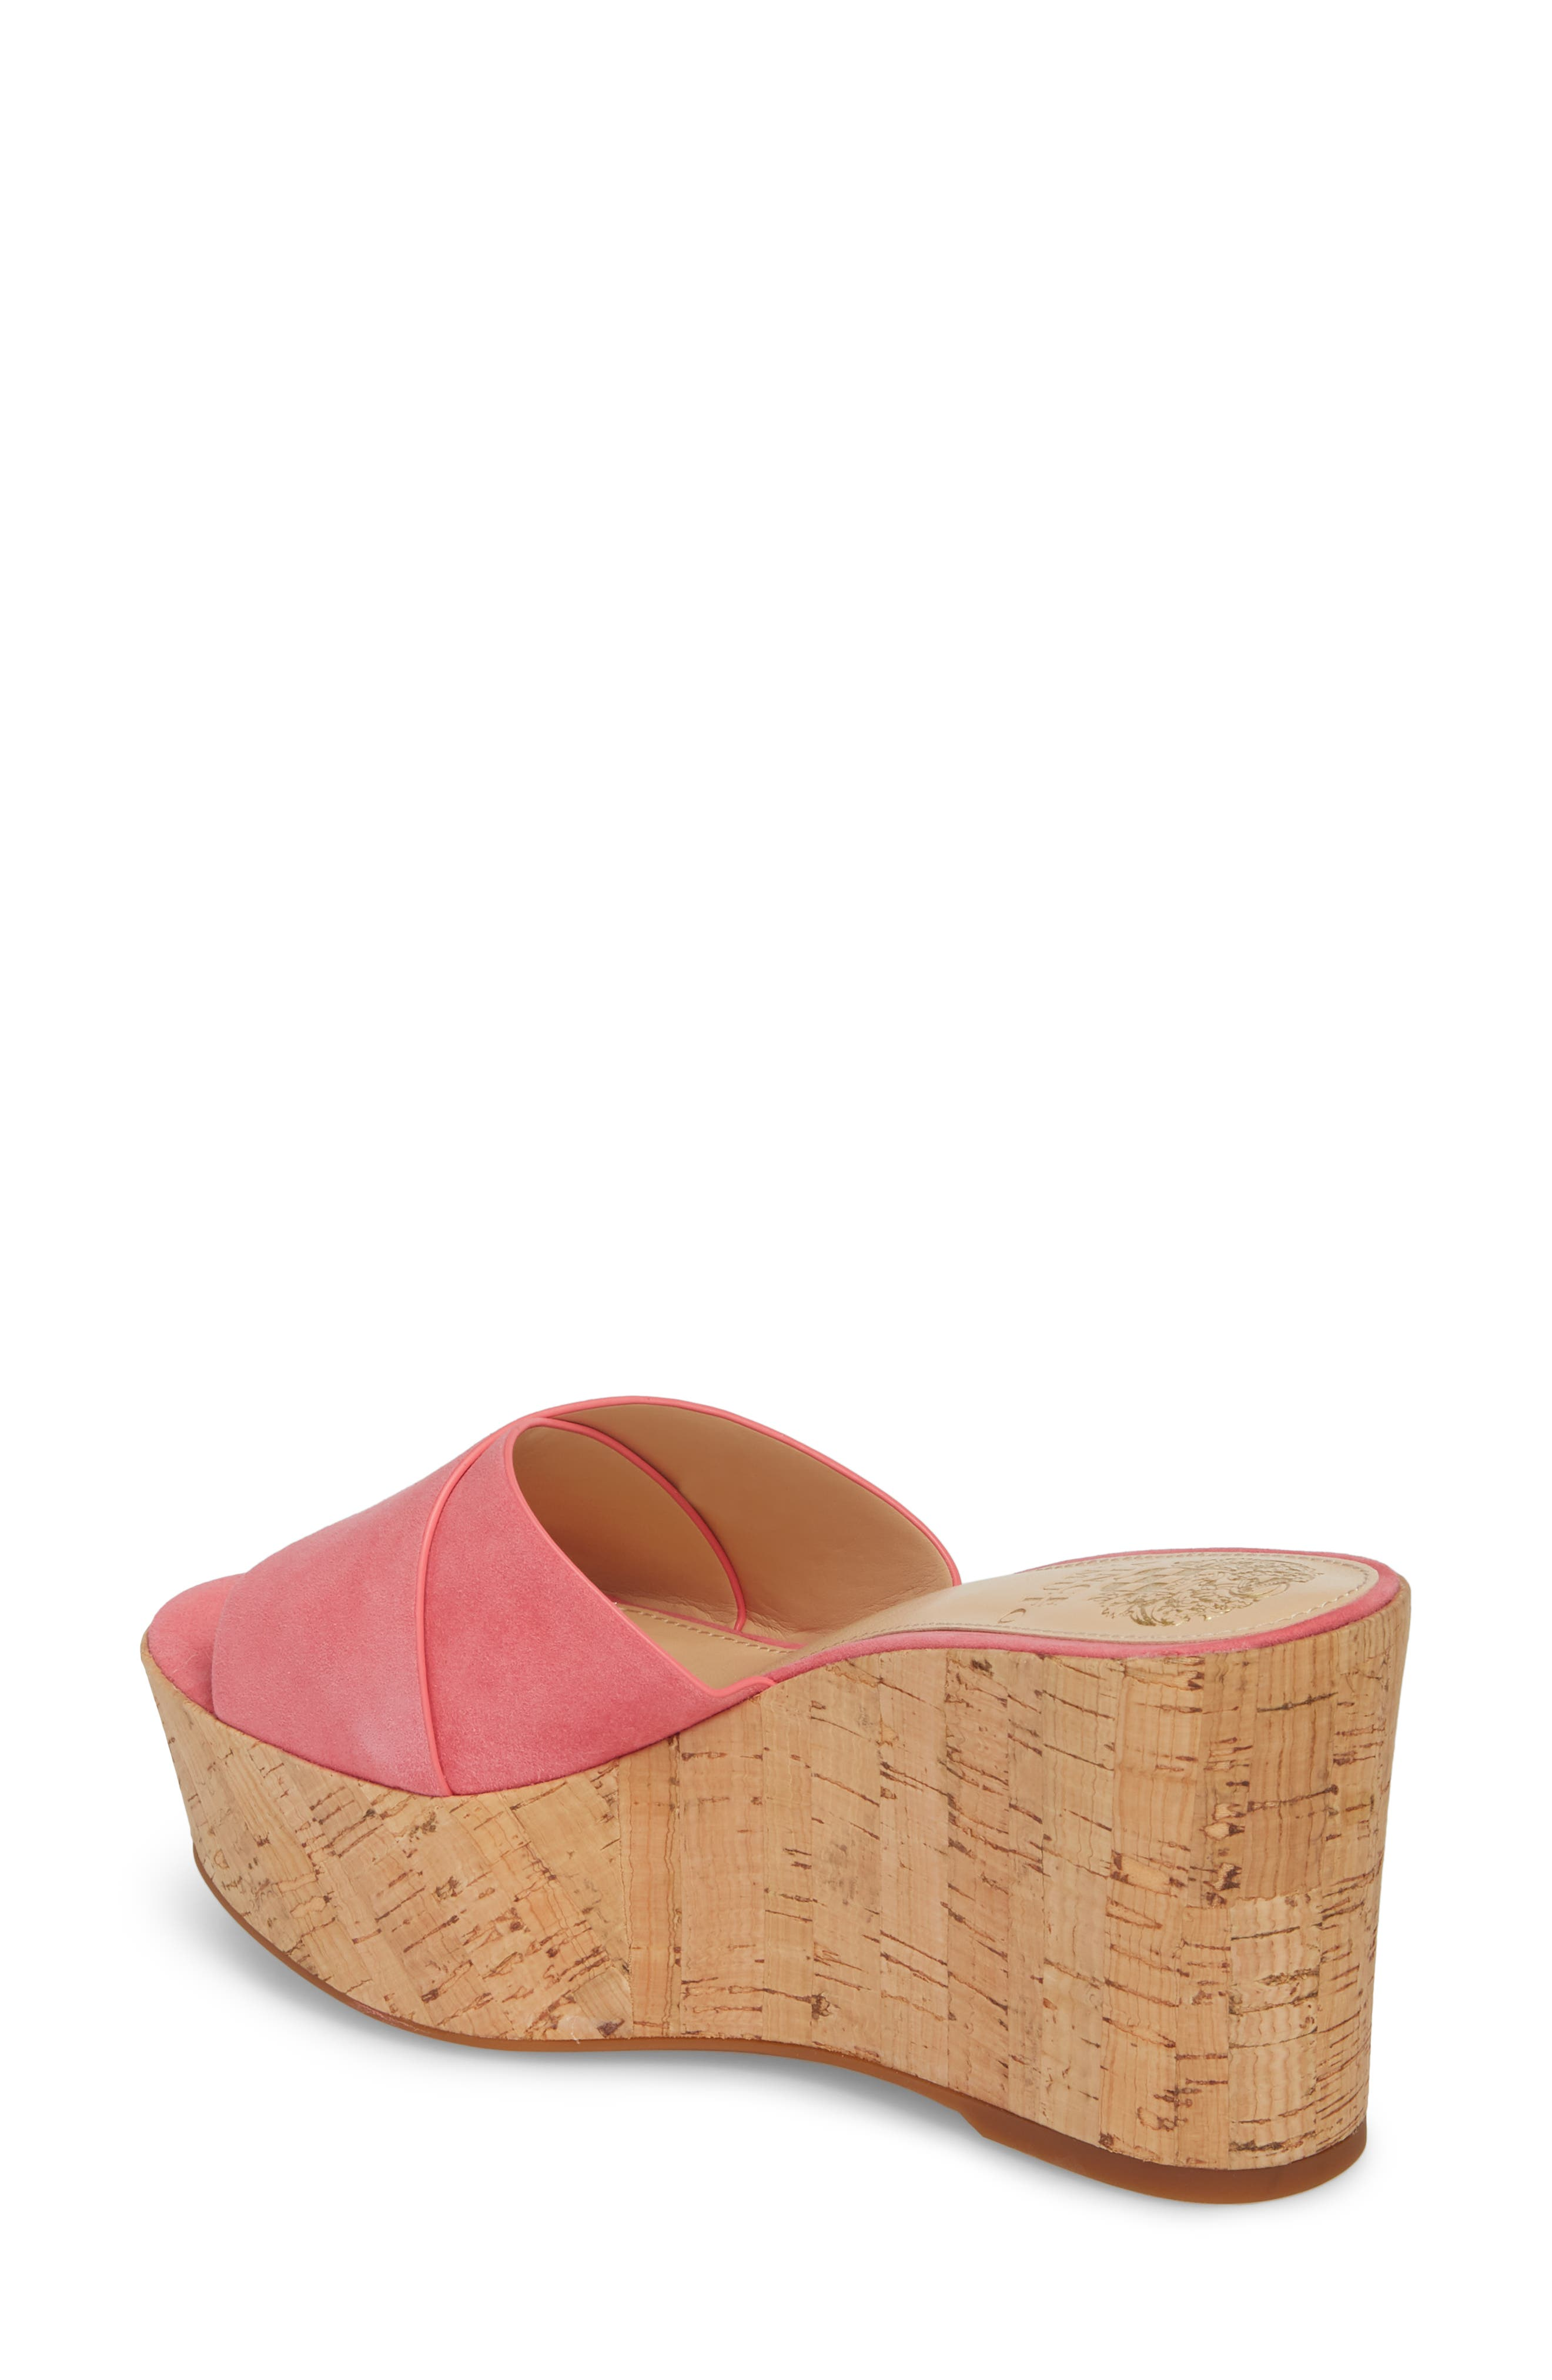 Kessina Platform Wedge Mule,                             Alternate thumbnail 2, color,                             Soft Pink Suede